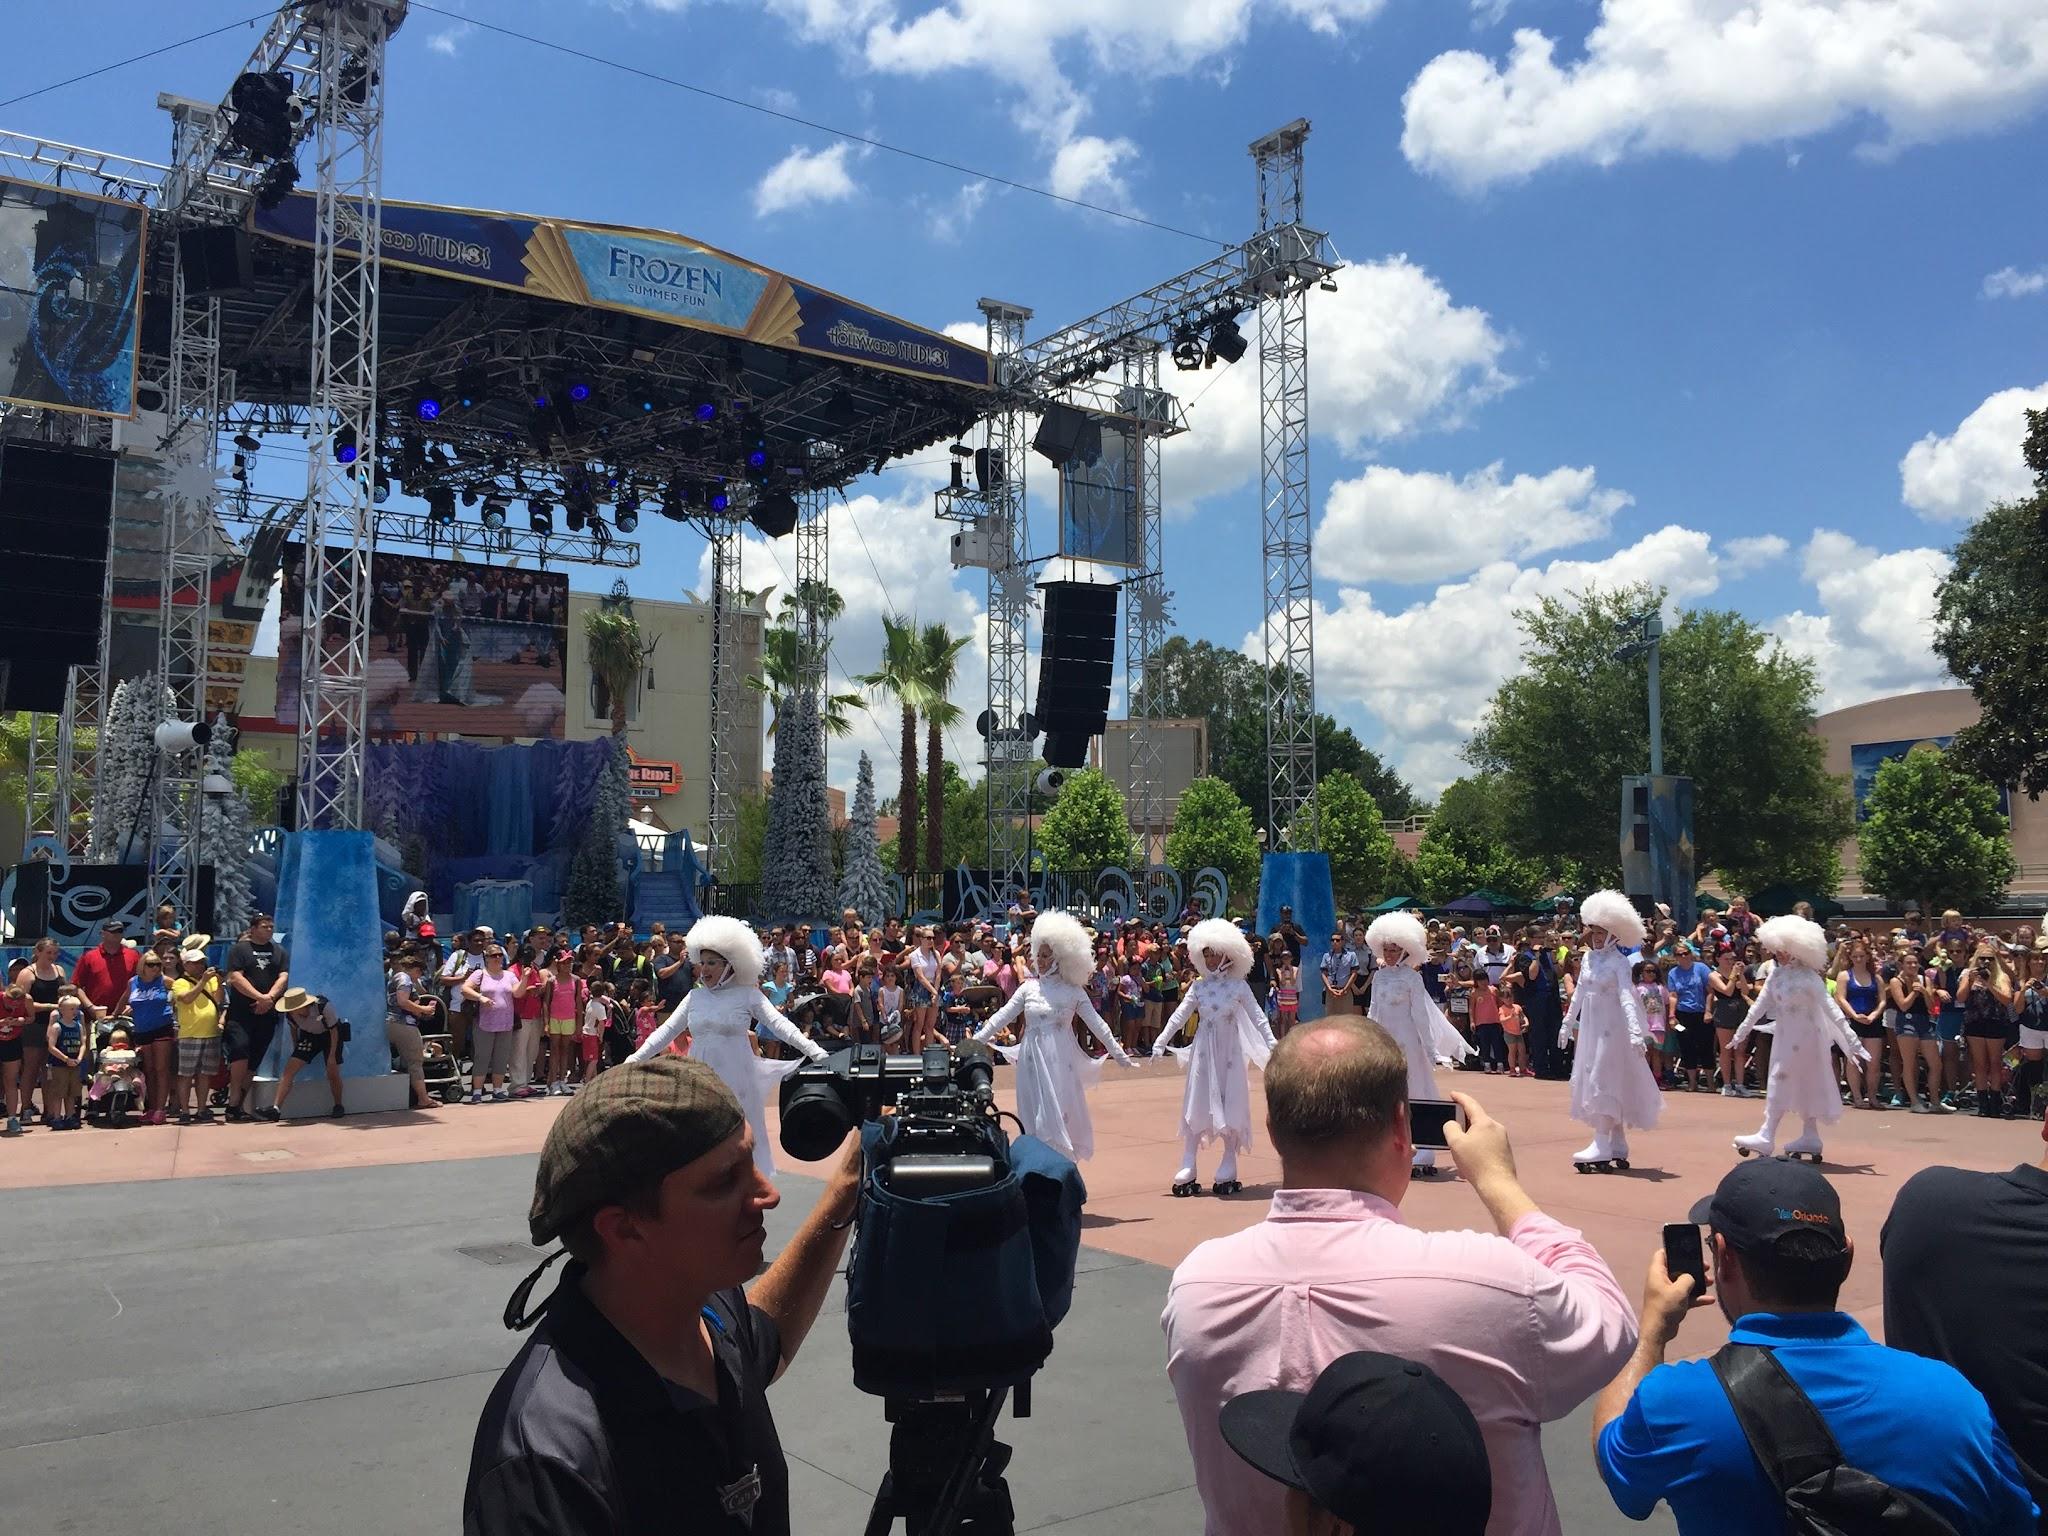 2015 Frozen Summer Fun Starts At Disneys Hollywood Studios